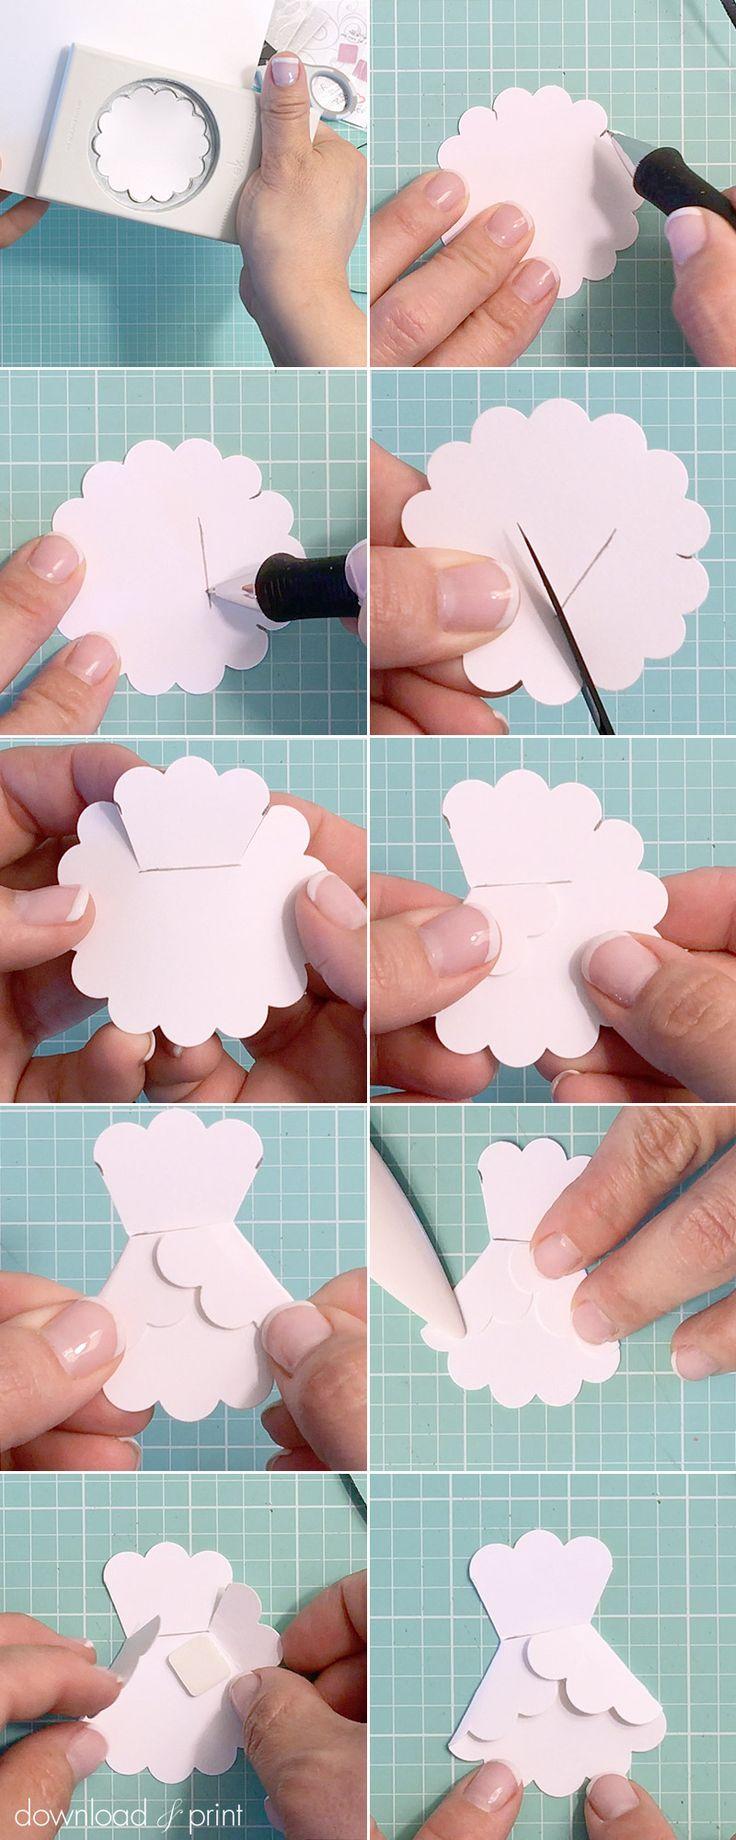 3D paper wedding dress shower invitation   Download & Print